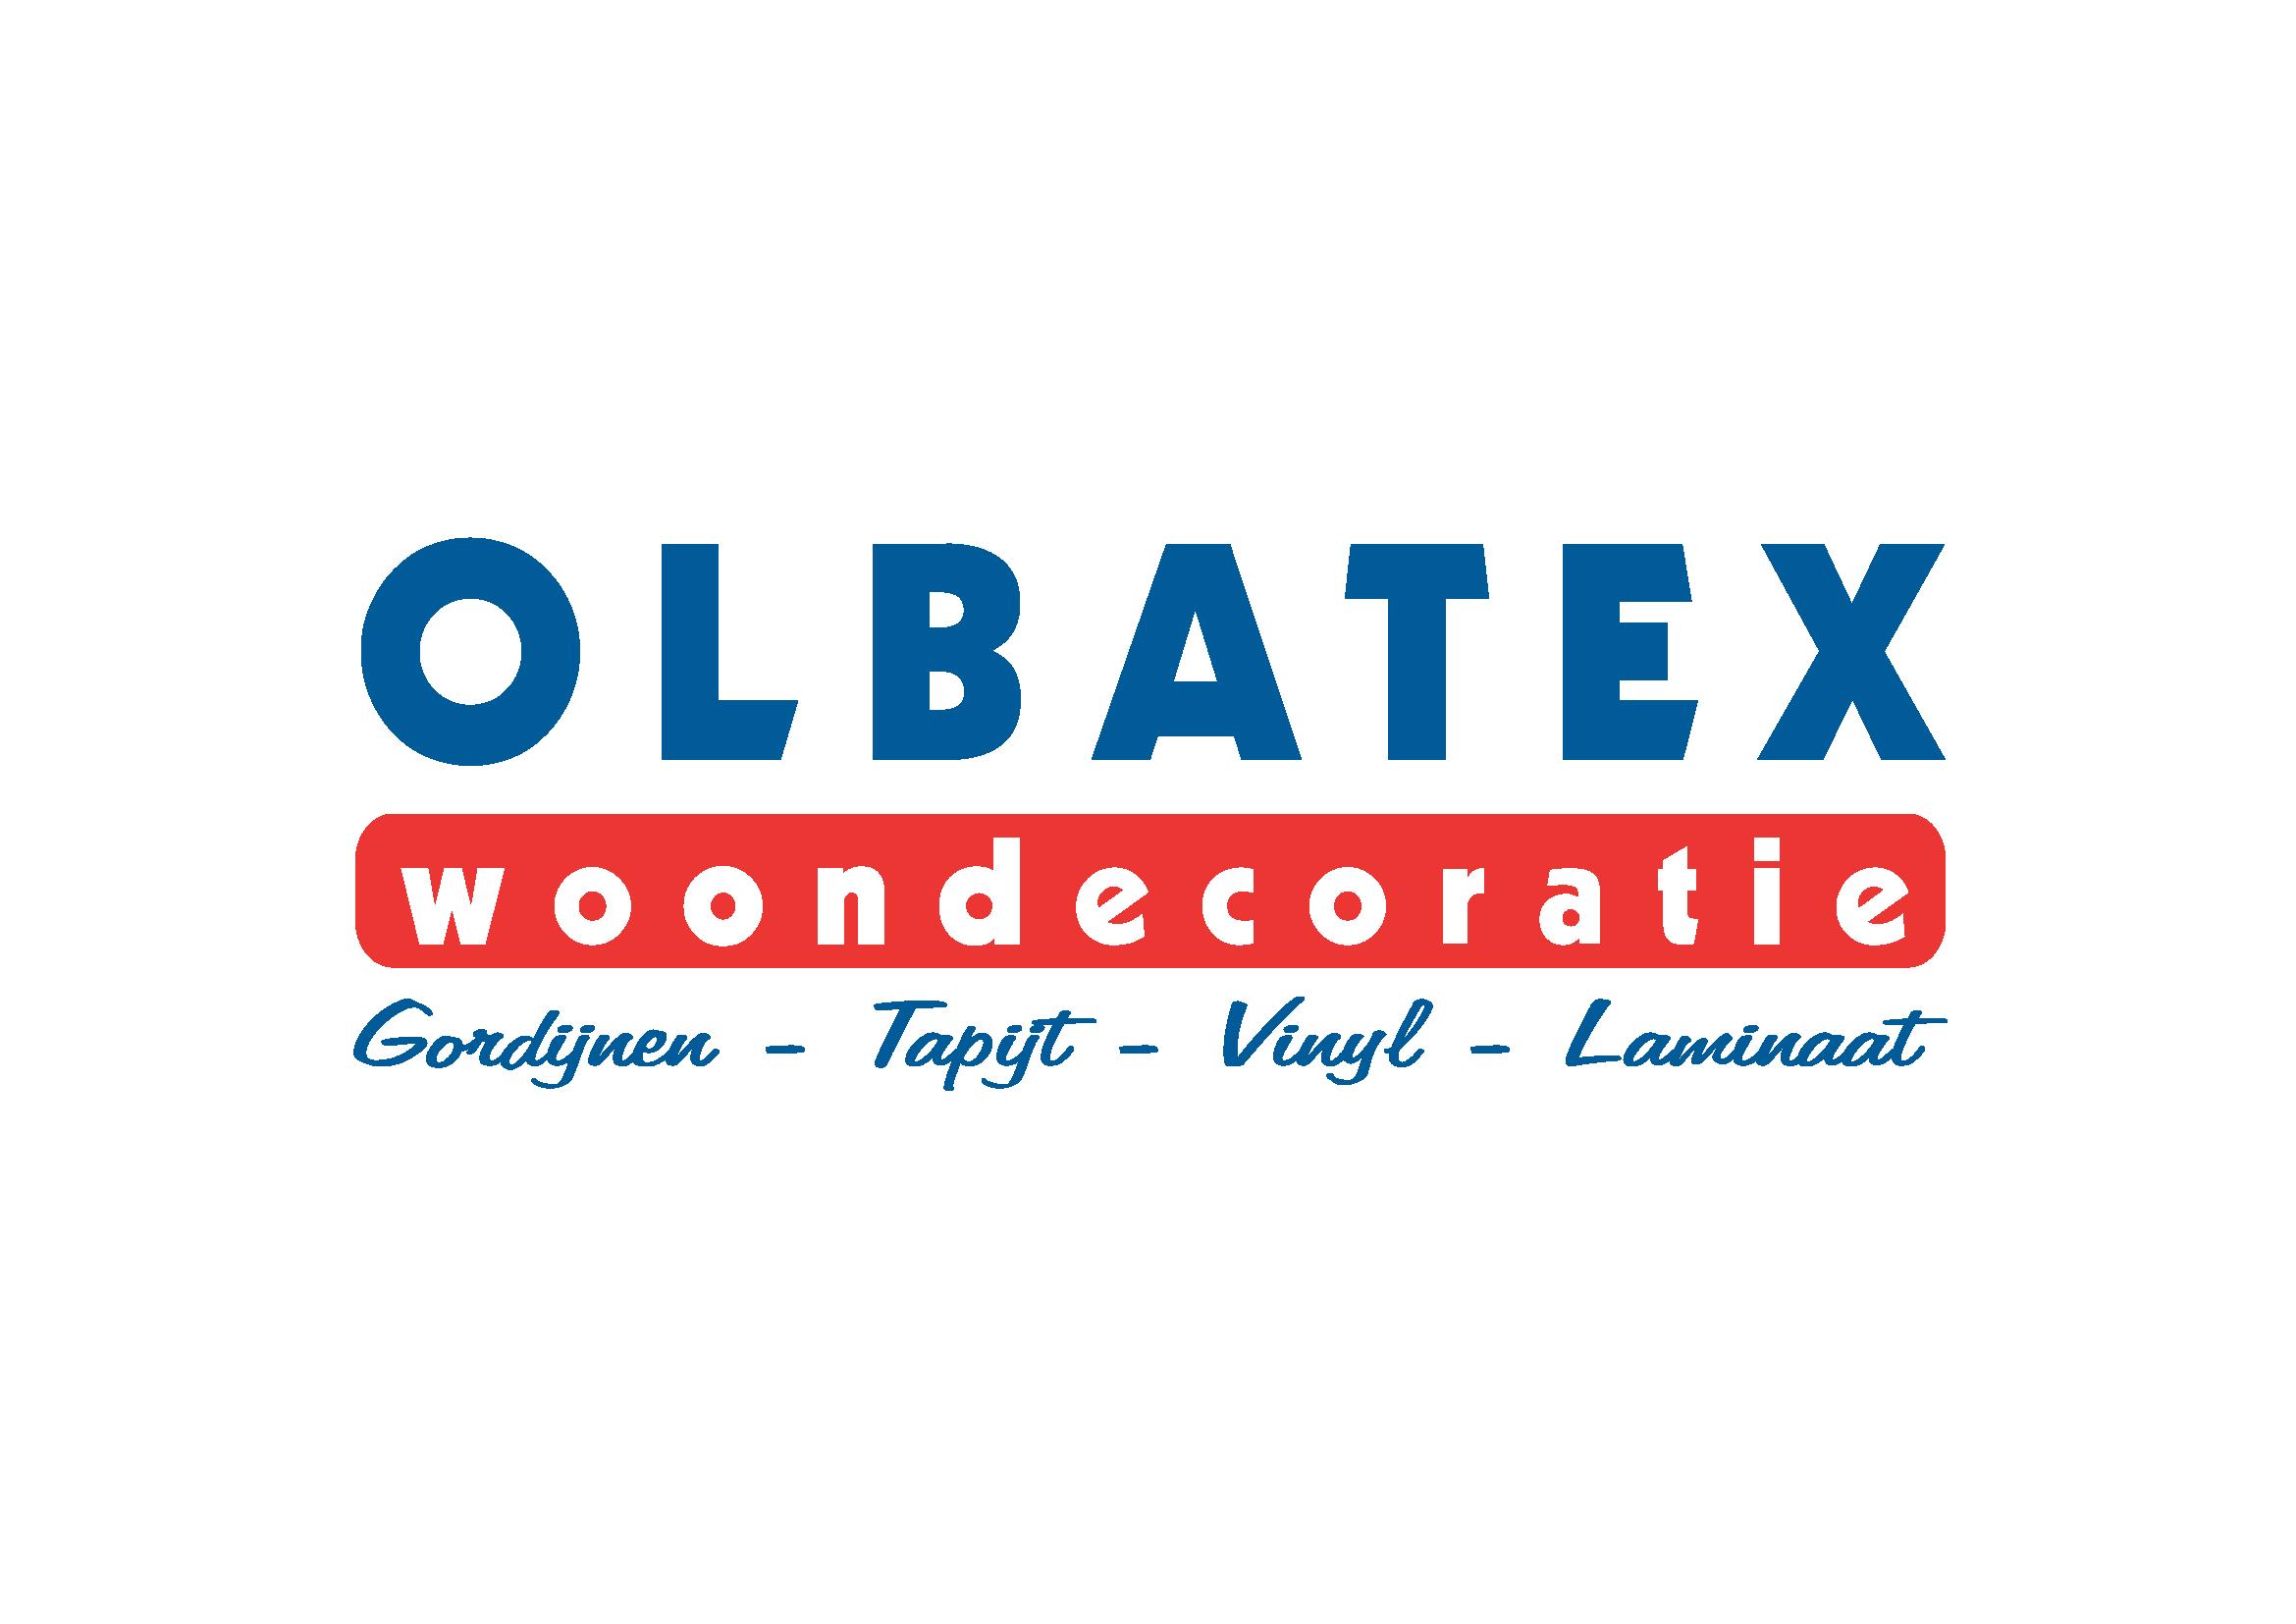 14 Olbatex - logo